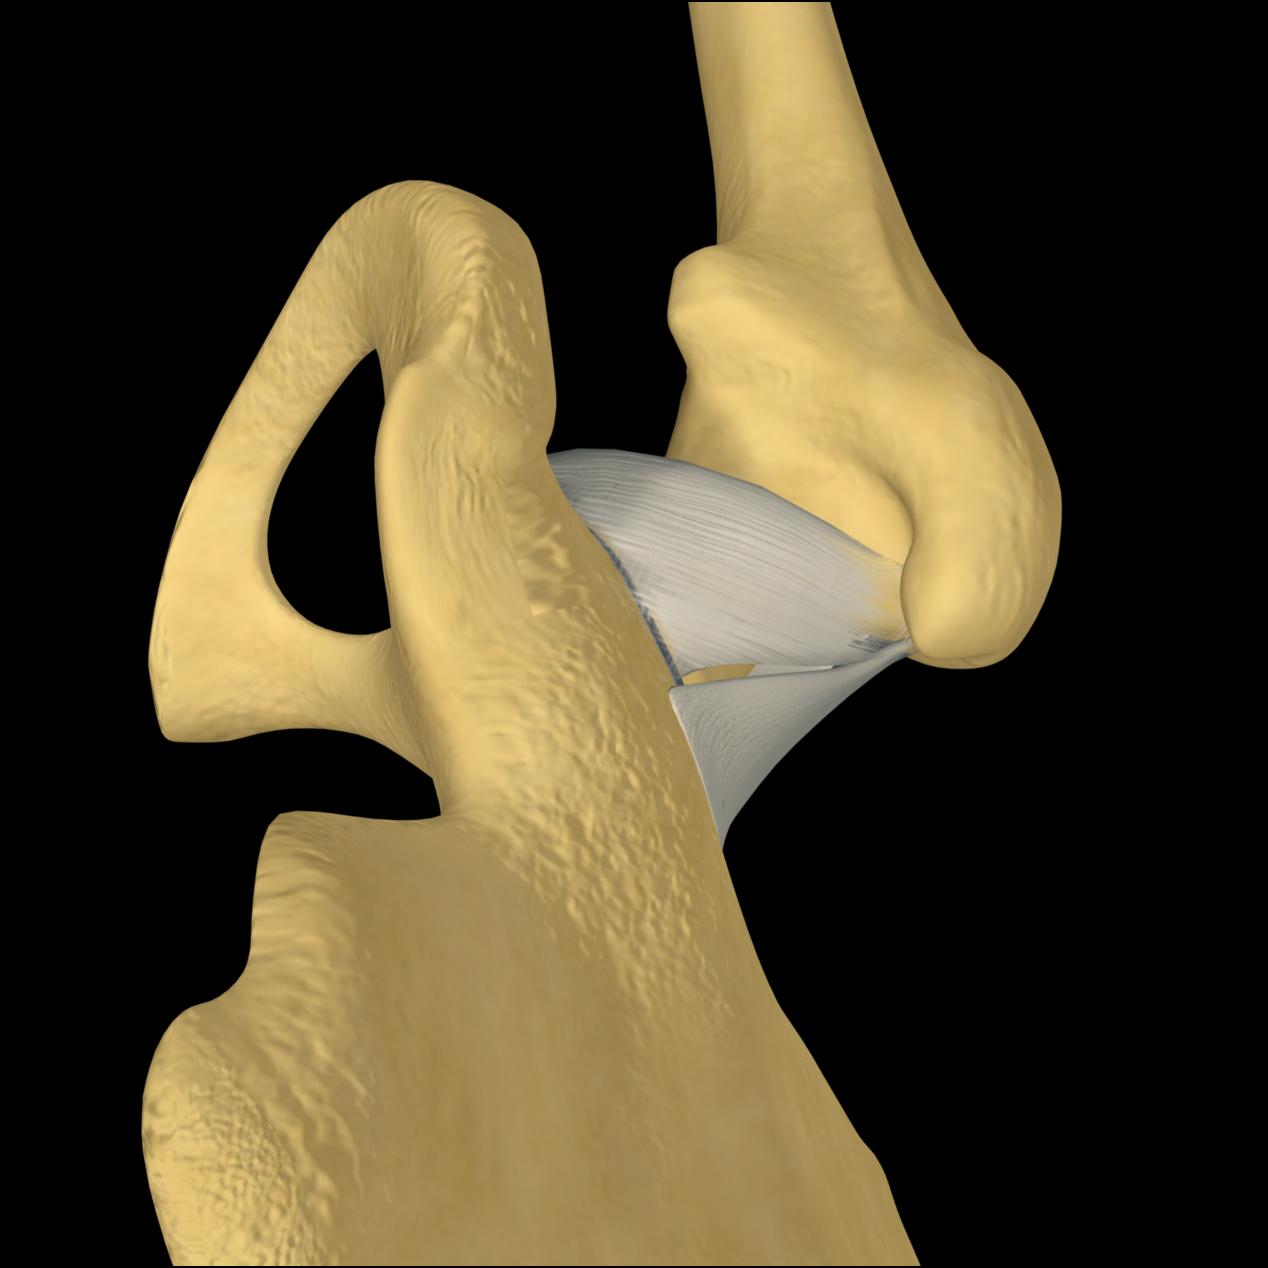 Anatomyexpert Ischiofemoral Ligament Structure Detail